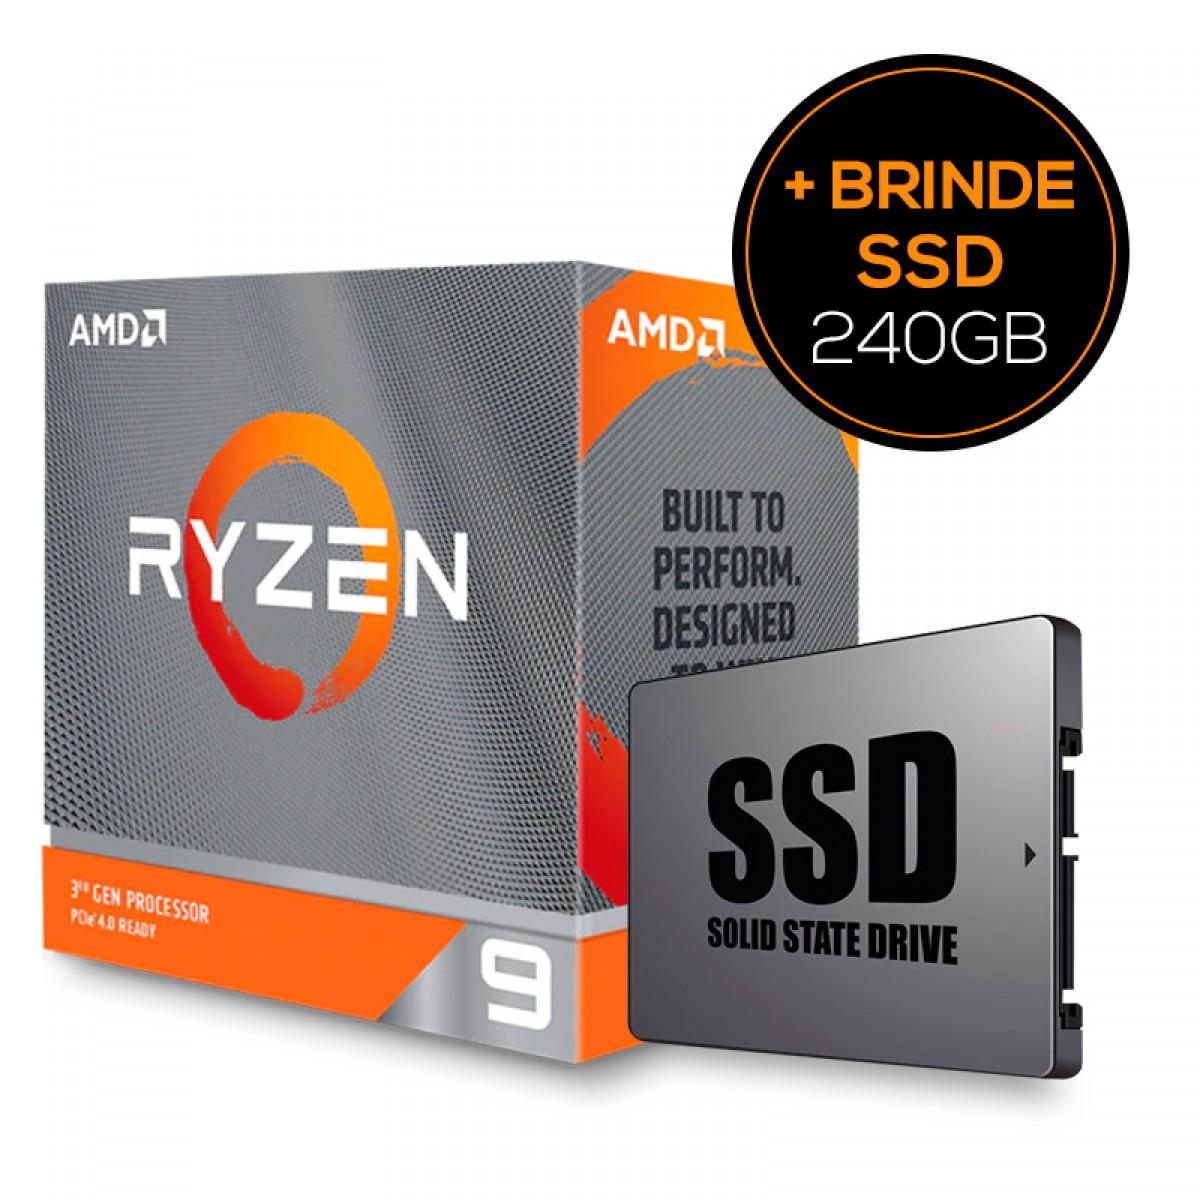 Kit Processador AMD Ryzen 9 3950x 3.5Ghz + Grátis SSD 240GB